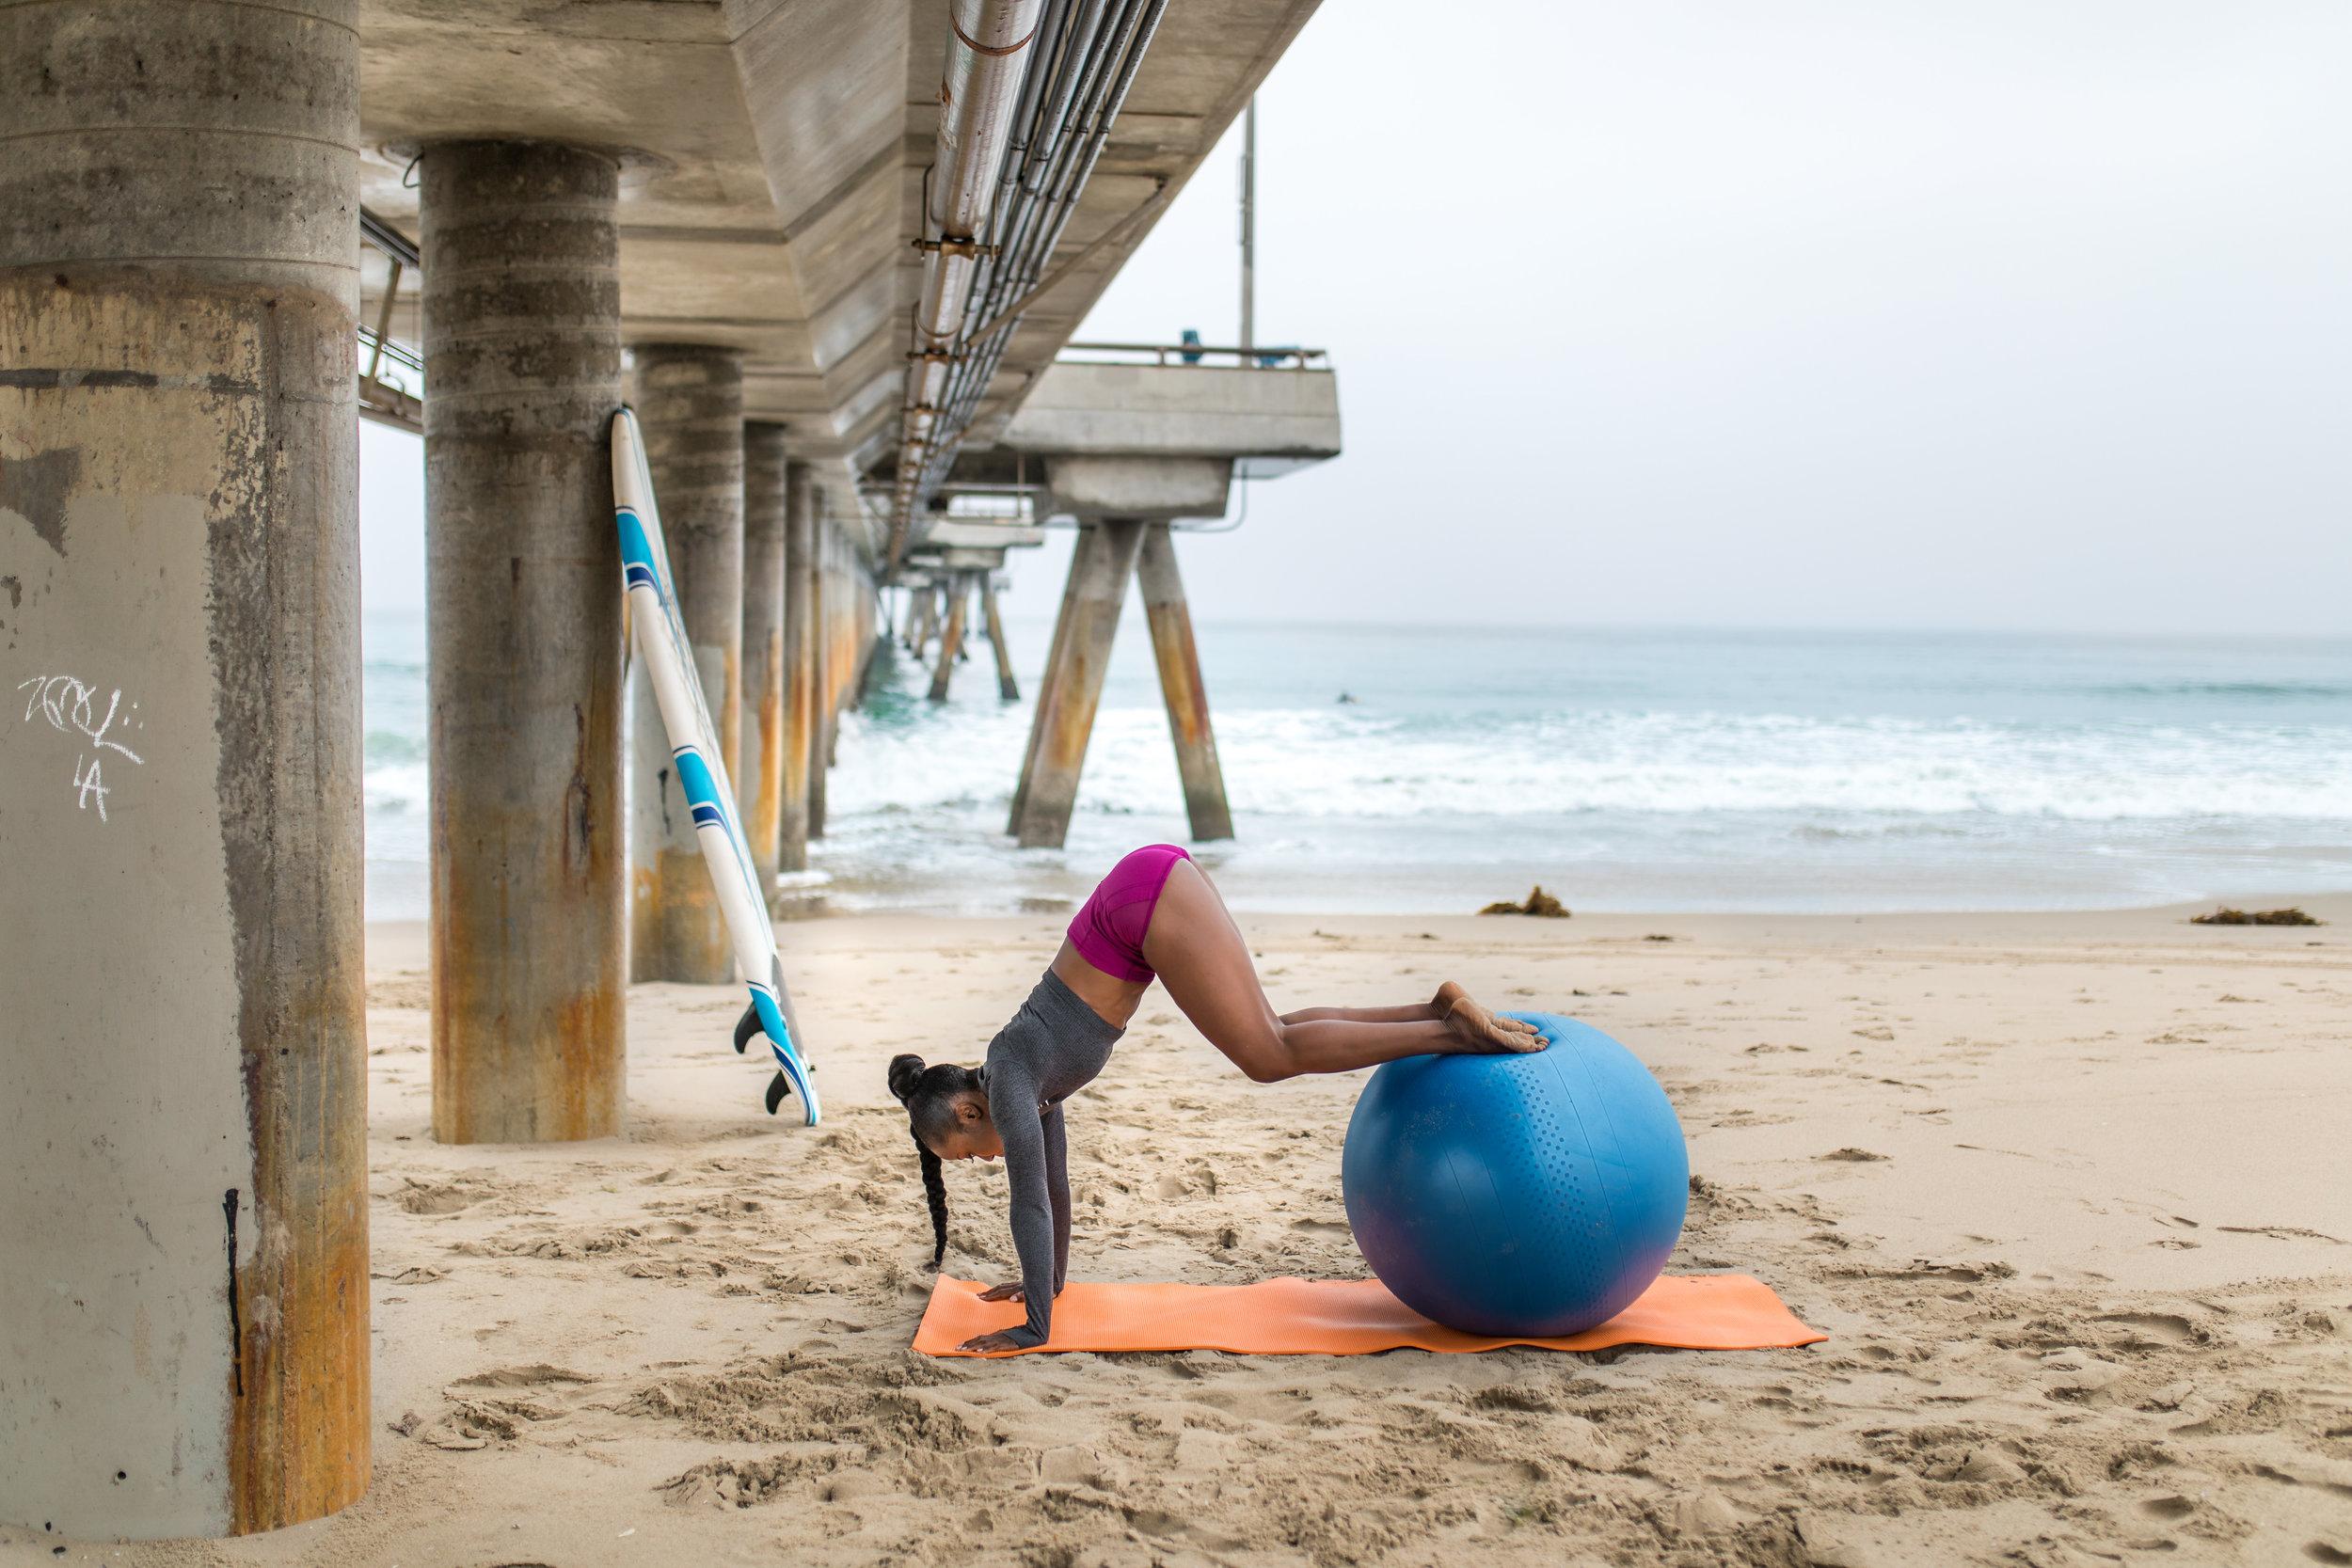 Livestrong_Surf Workout-22.JPG